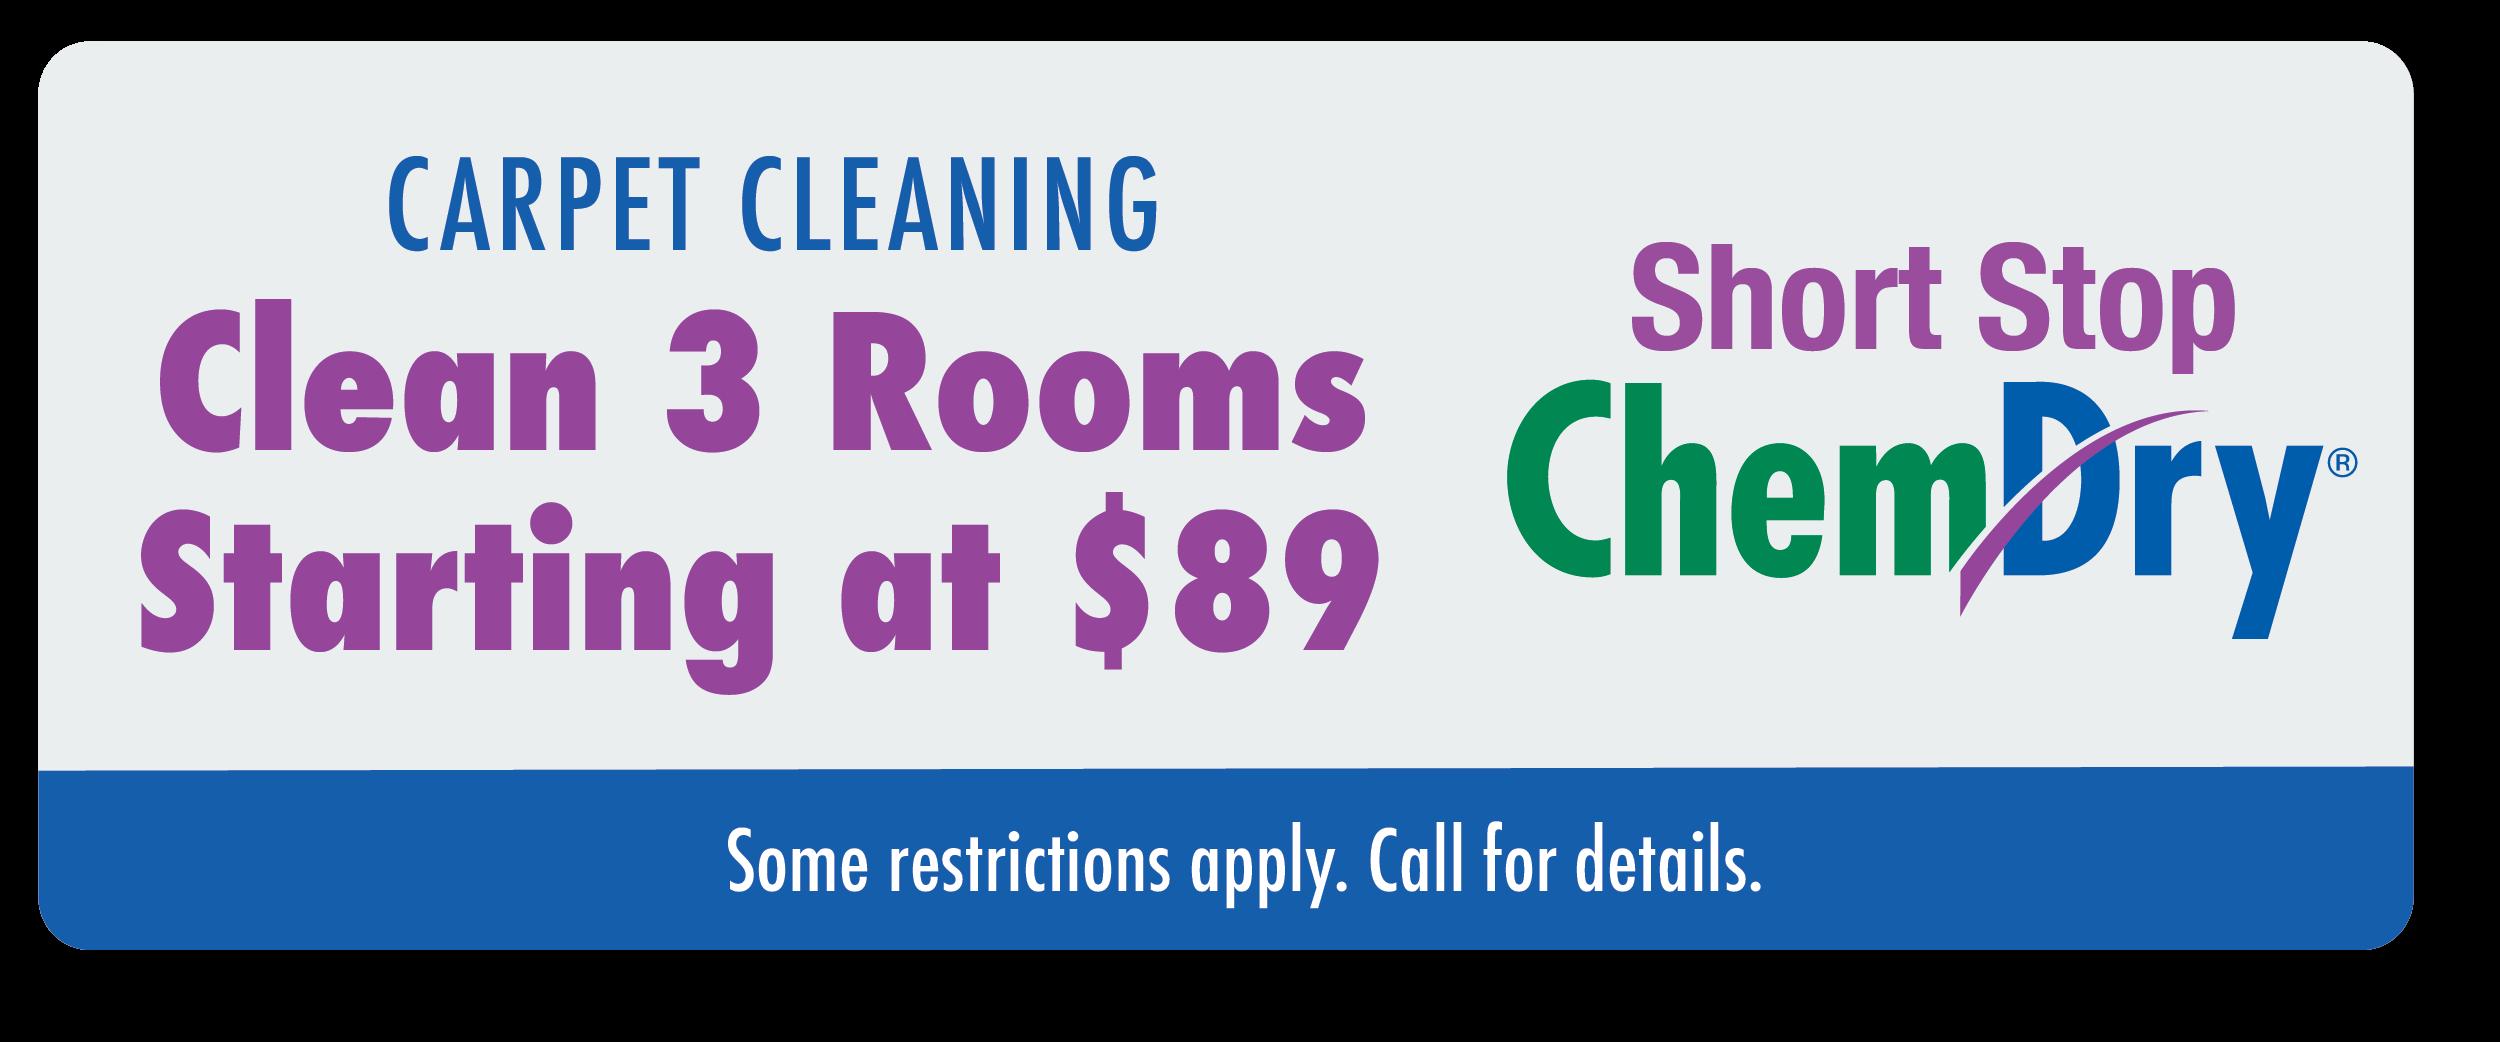 detroit carpet cleaning coupon